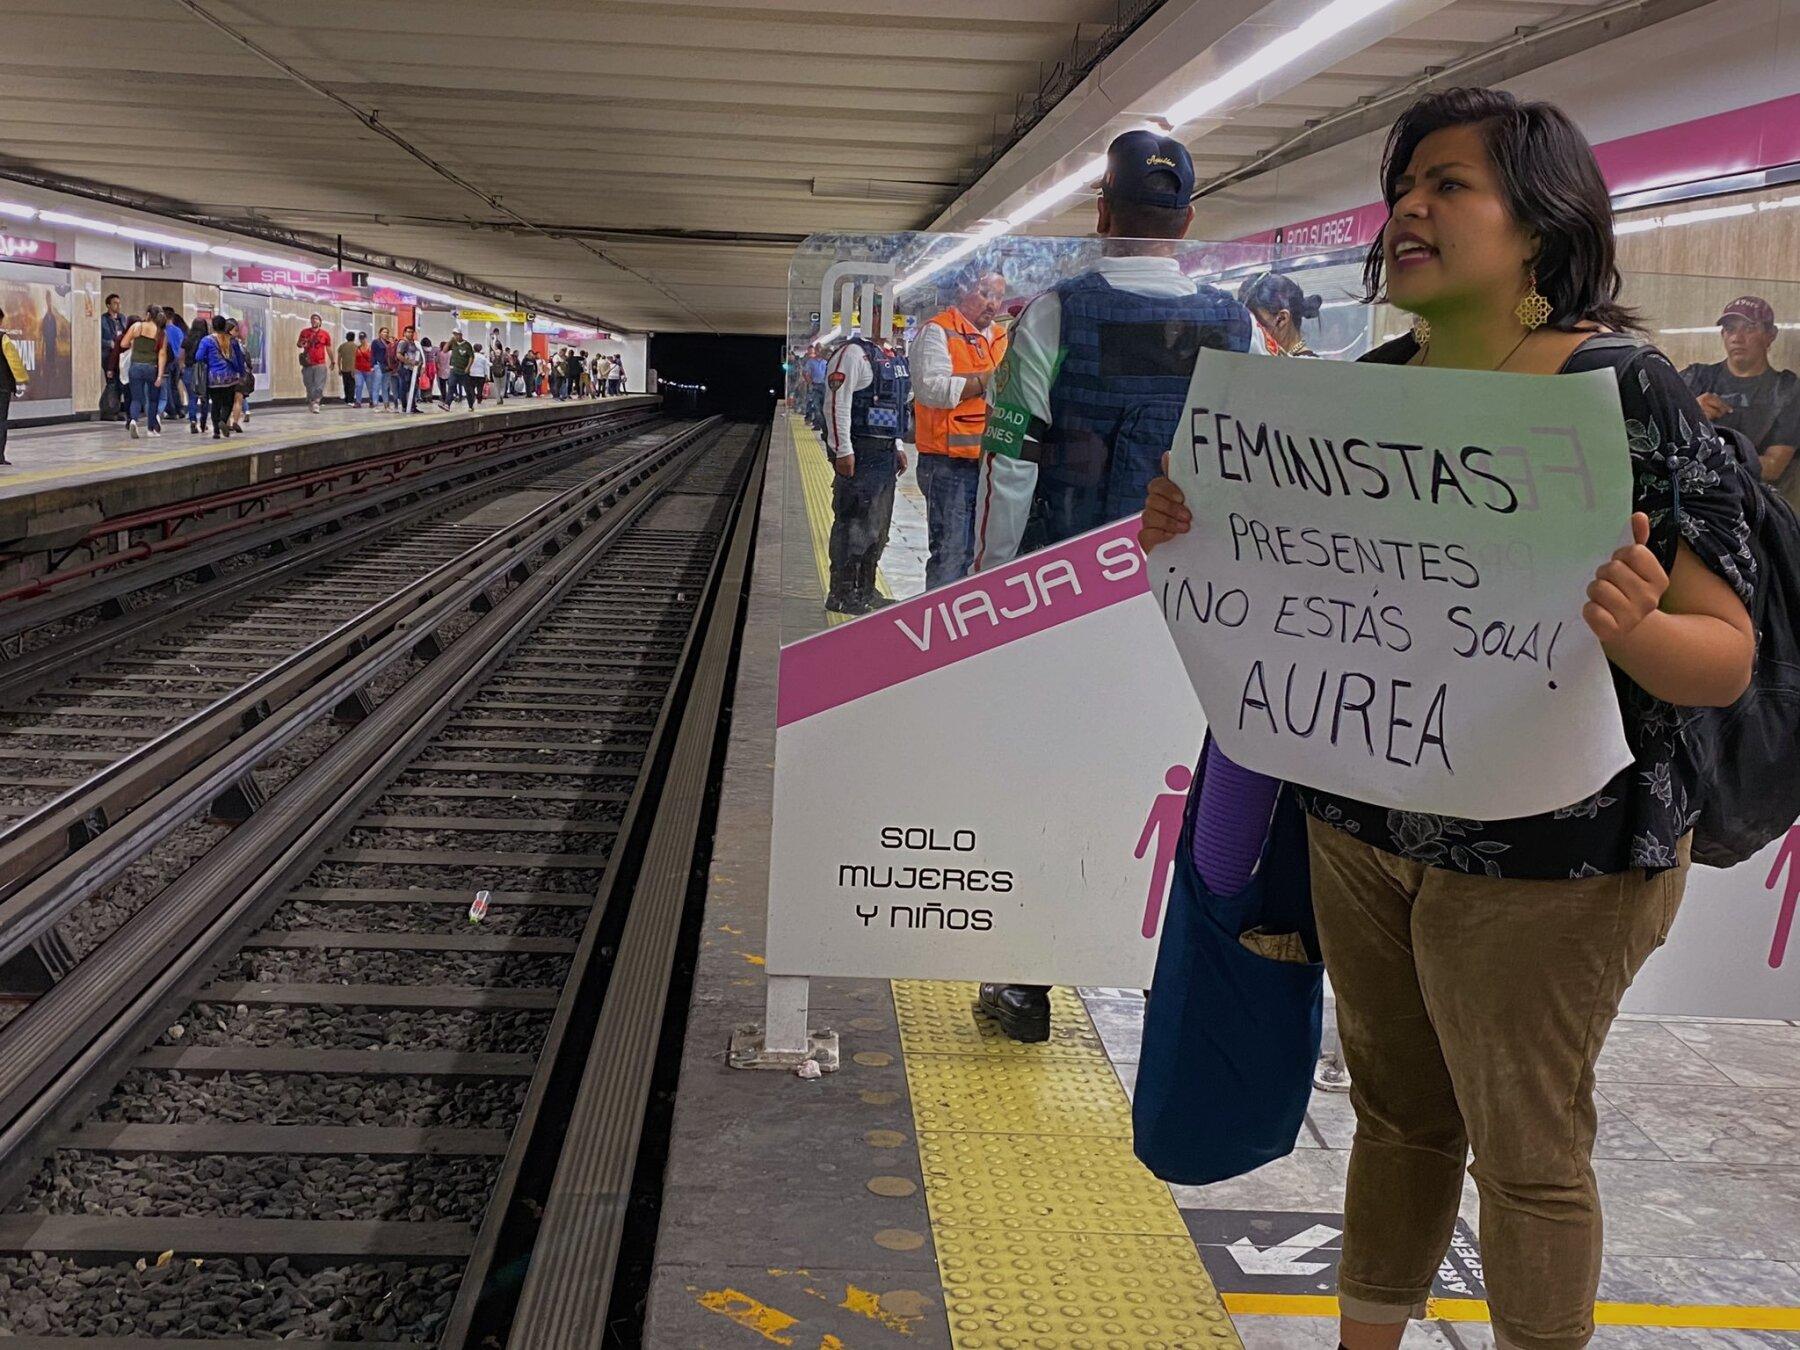 Feministas Metro.jpeg